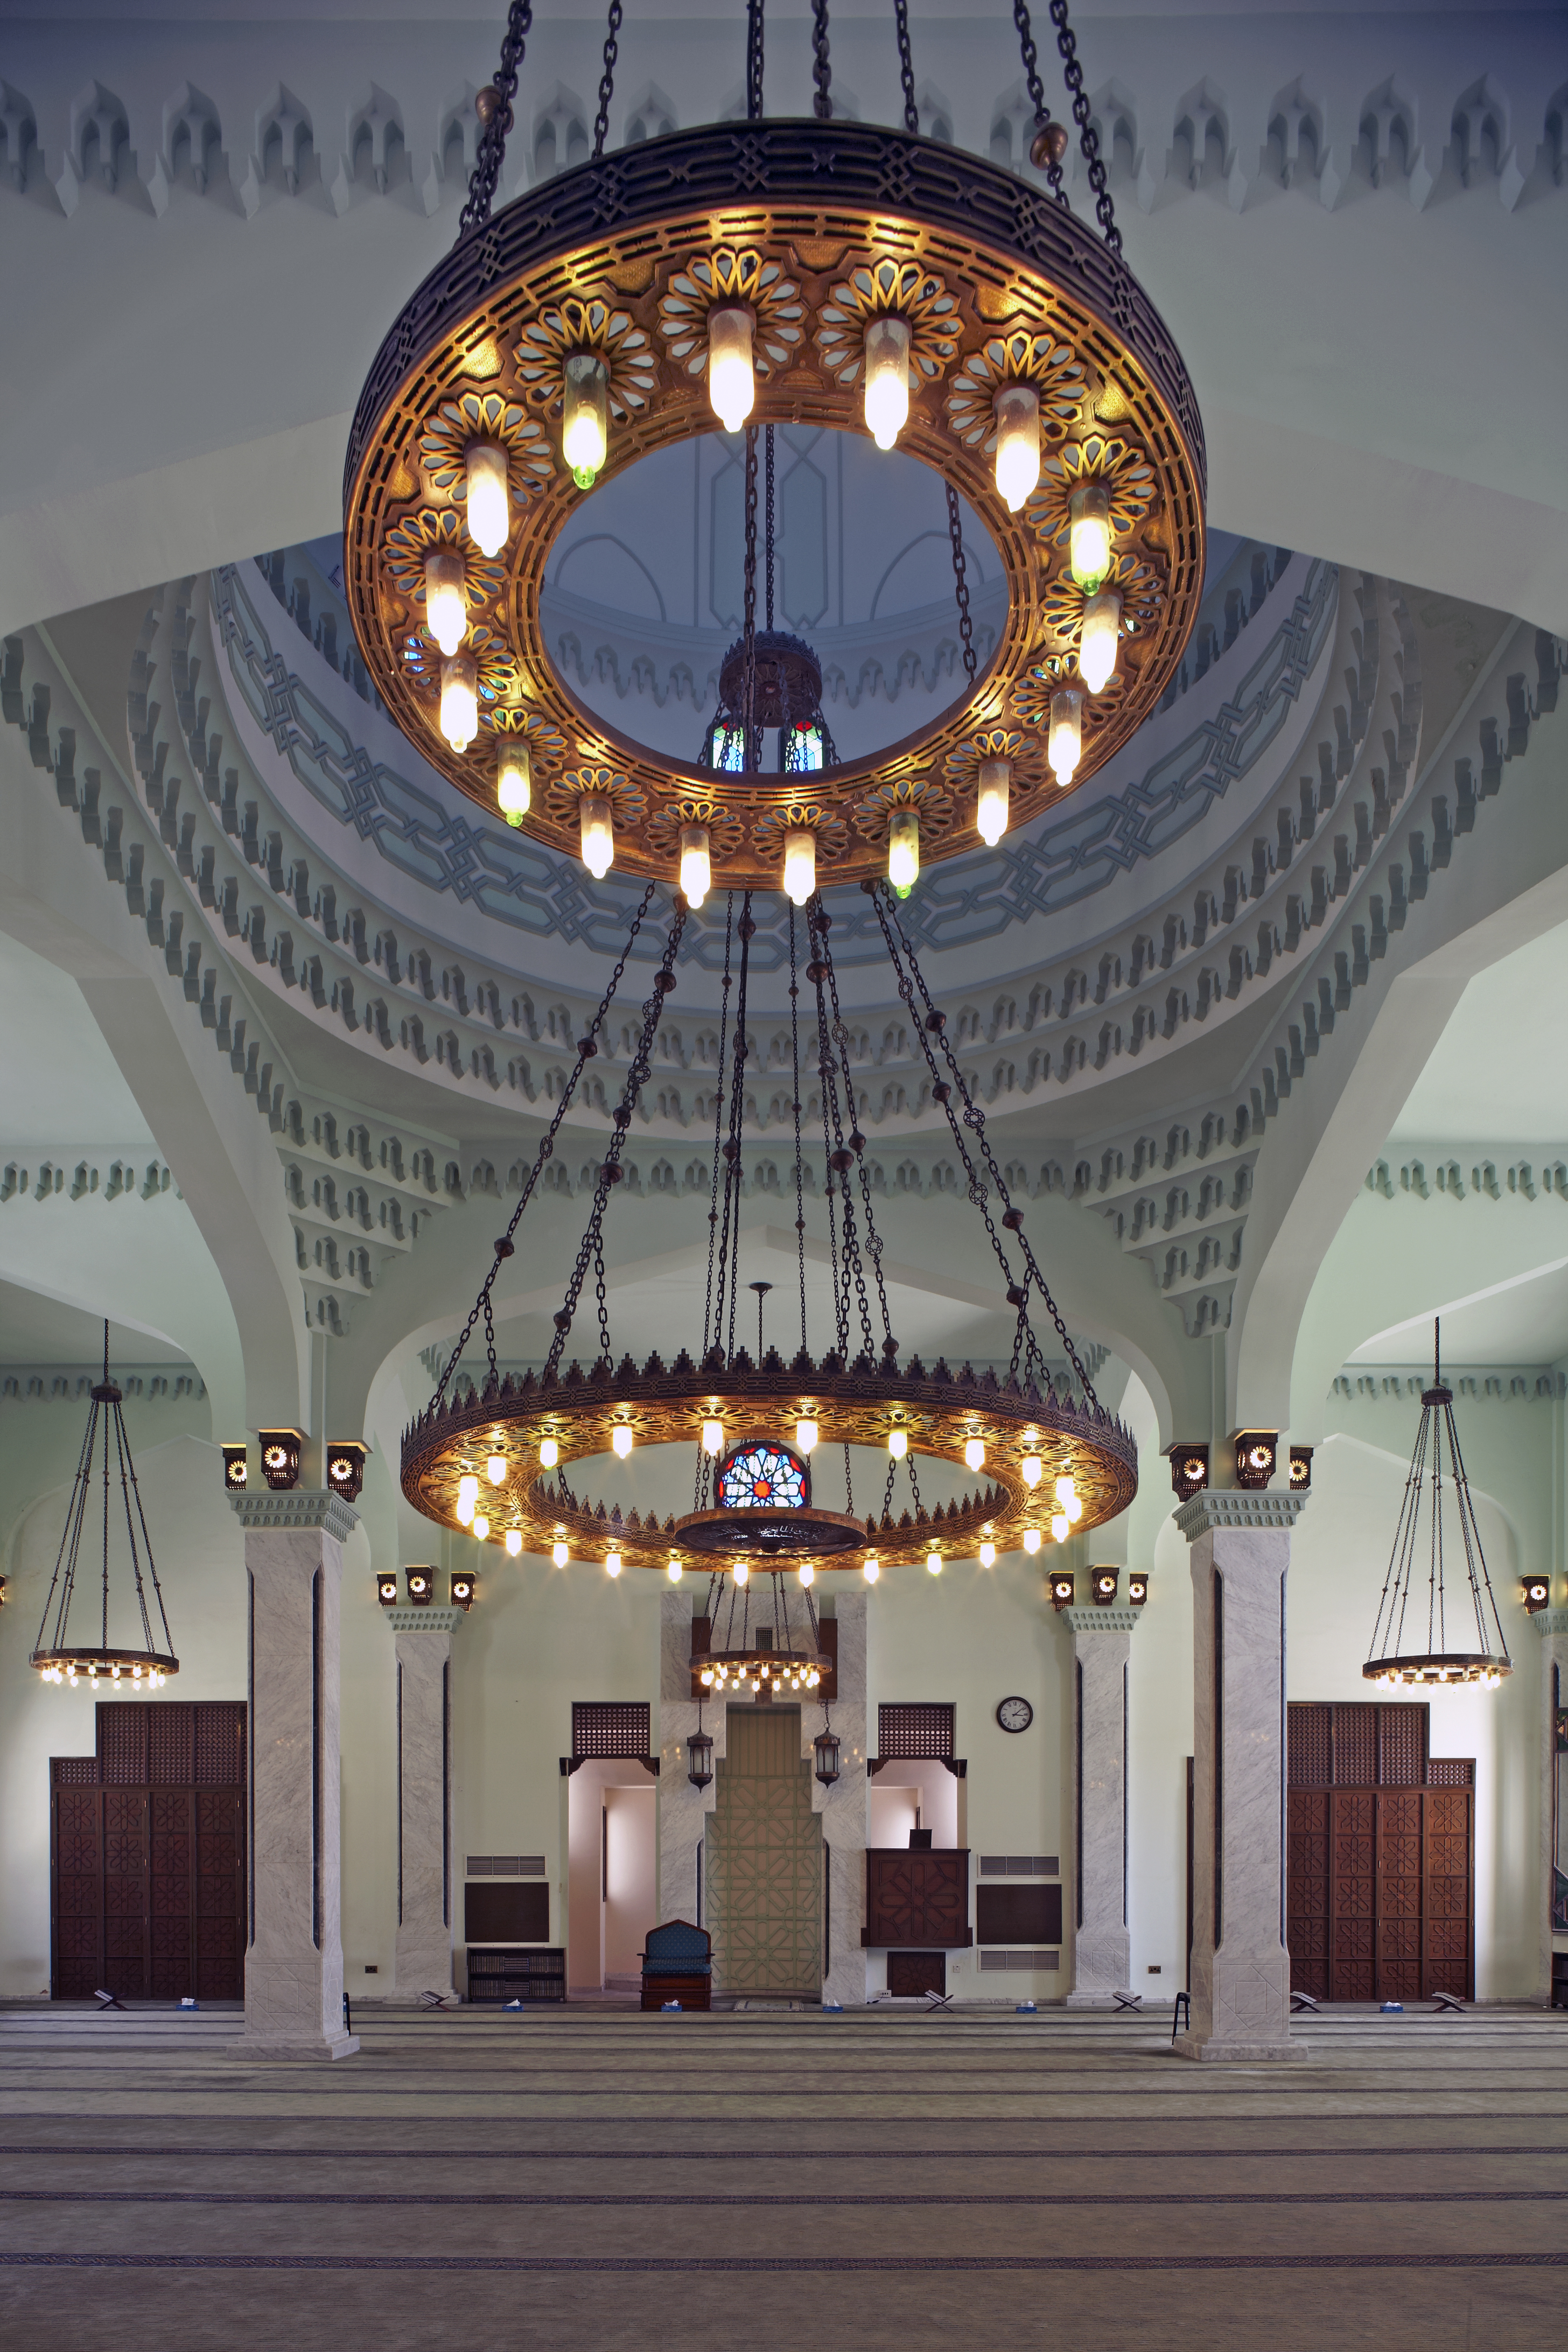 Mosques in Europe! - European Mosques? | zenith.me - Islam ...